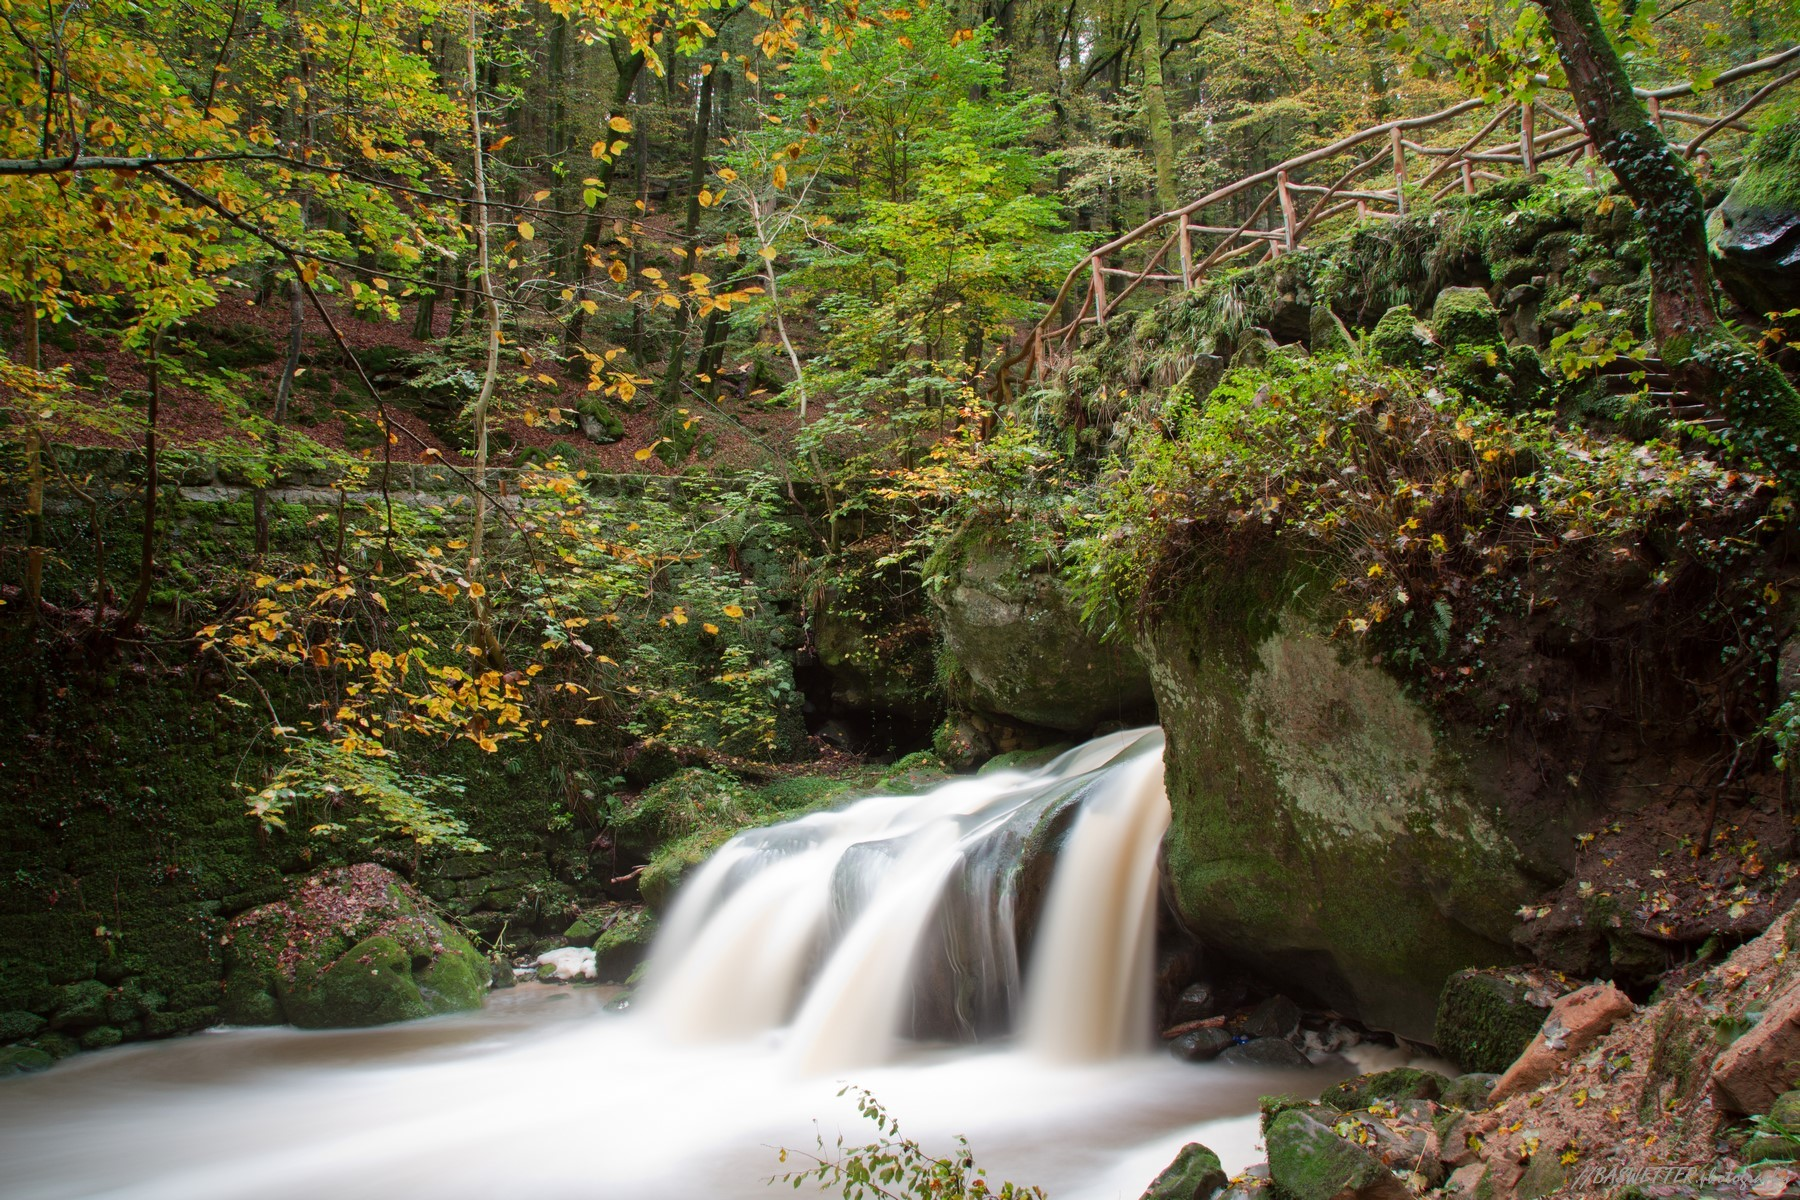 Waterval Schiessentumpel in de herfst op de Mullerthal trail in Klein Zwitserland Luxemburg